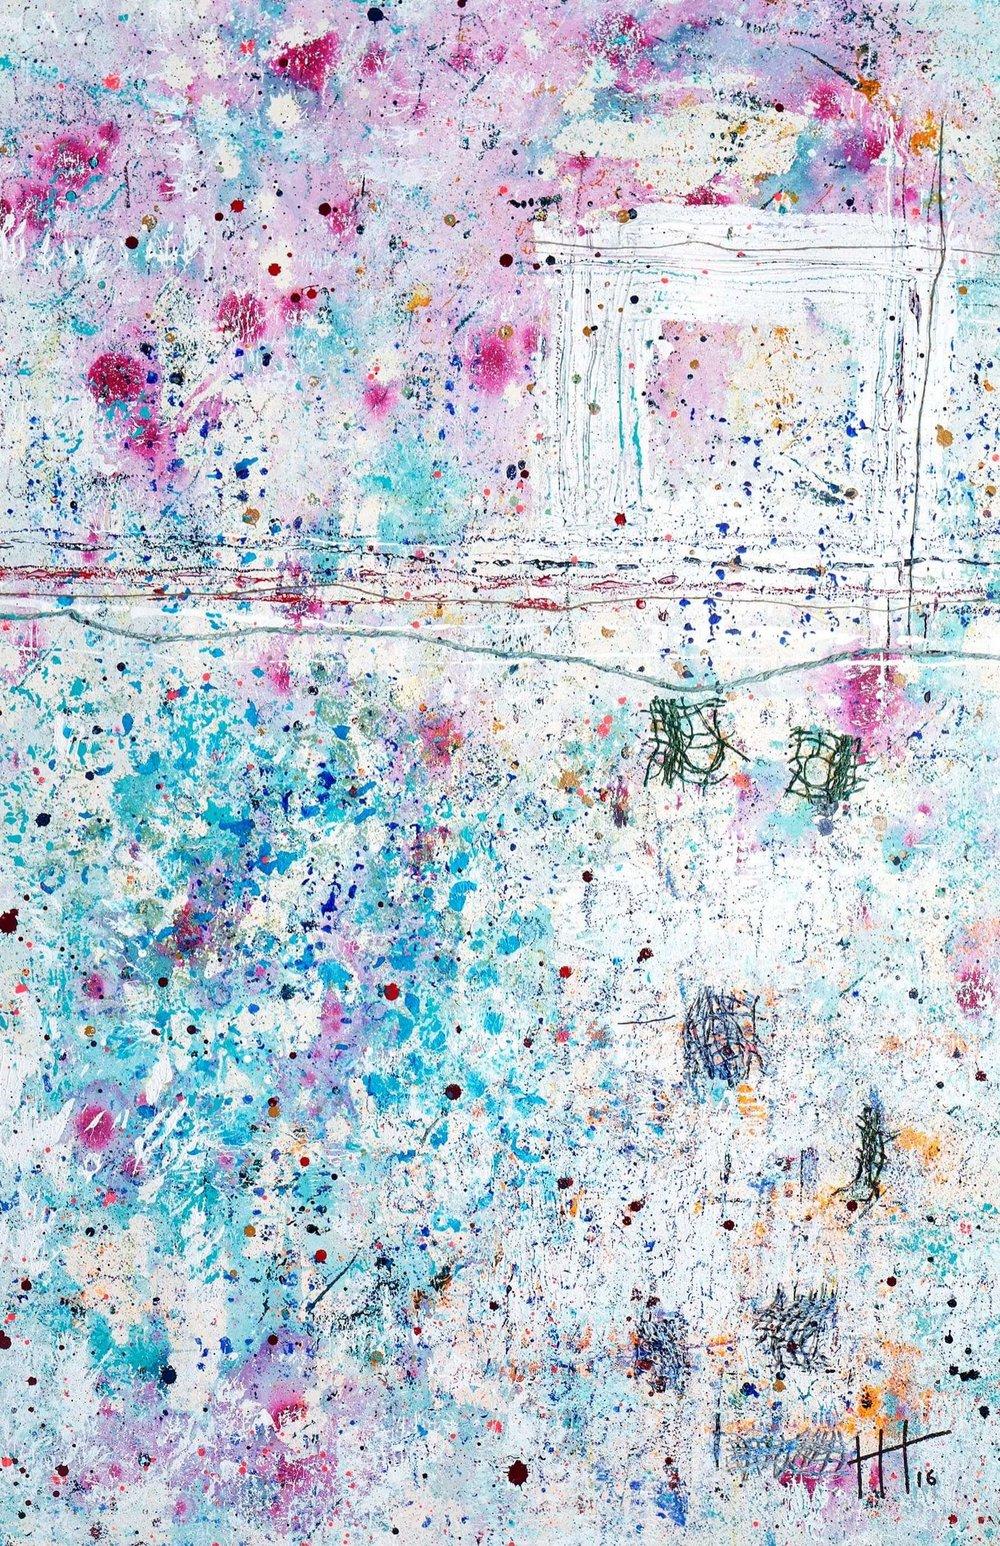 'The Glove Factory' Acrylic & Mixed Media /129cm x 93cm (framed) £1,750